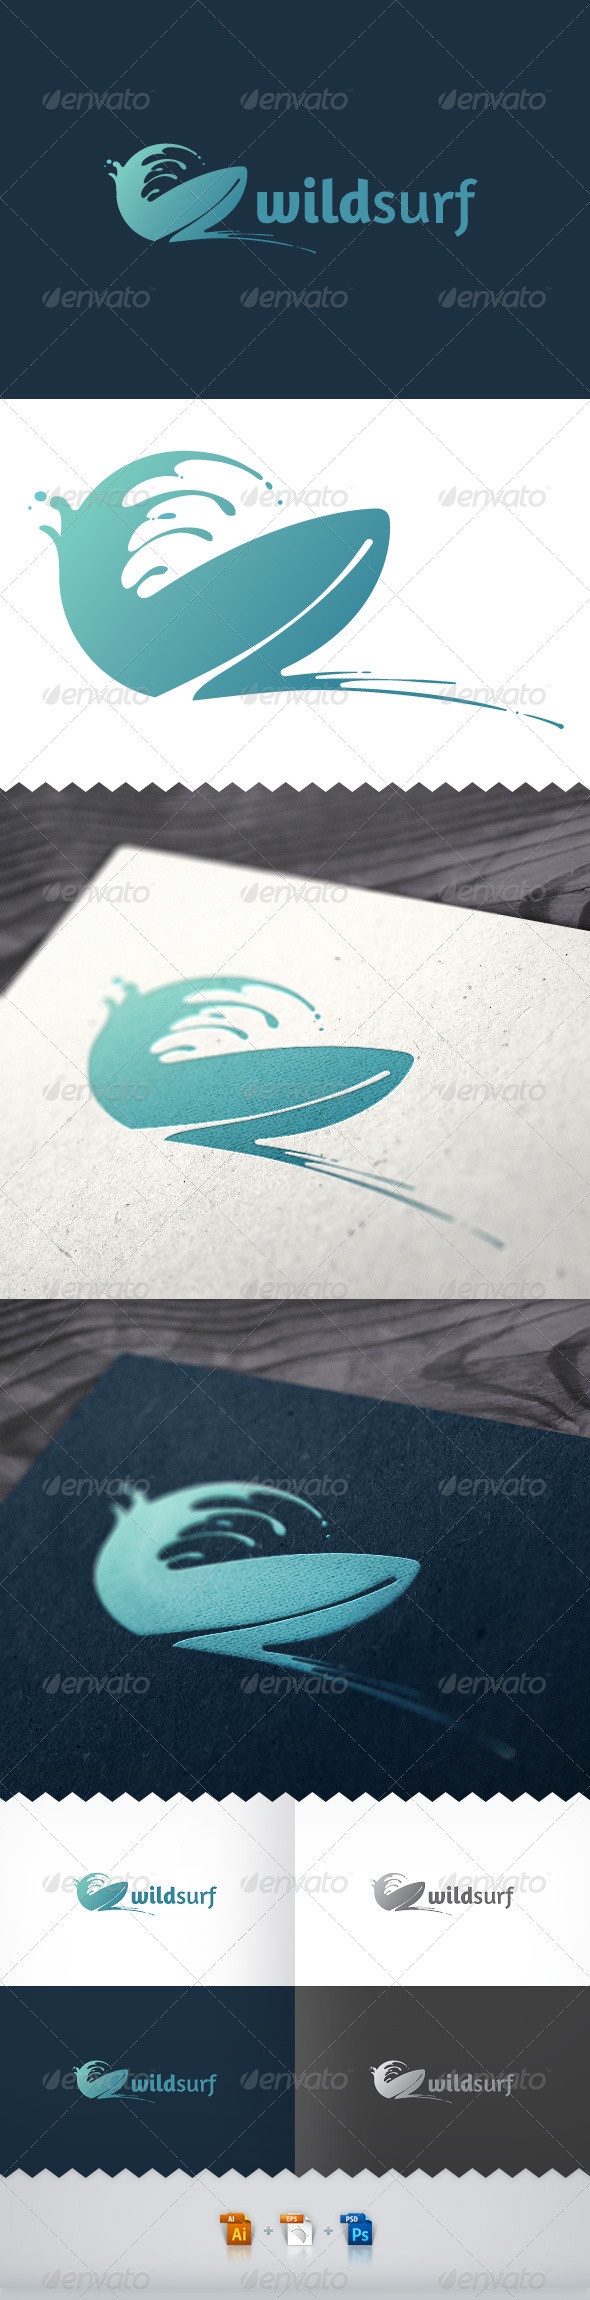 Wild Surf Tour Logo - Objects Logo Templates